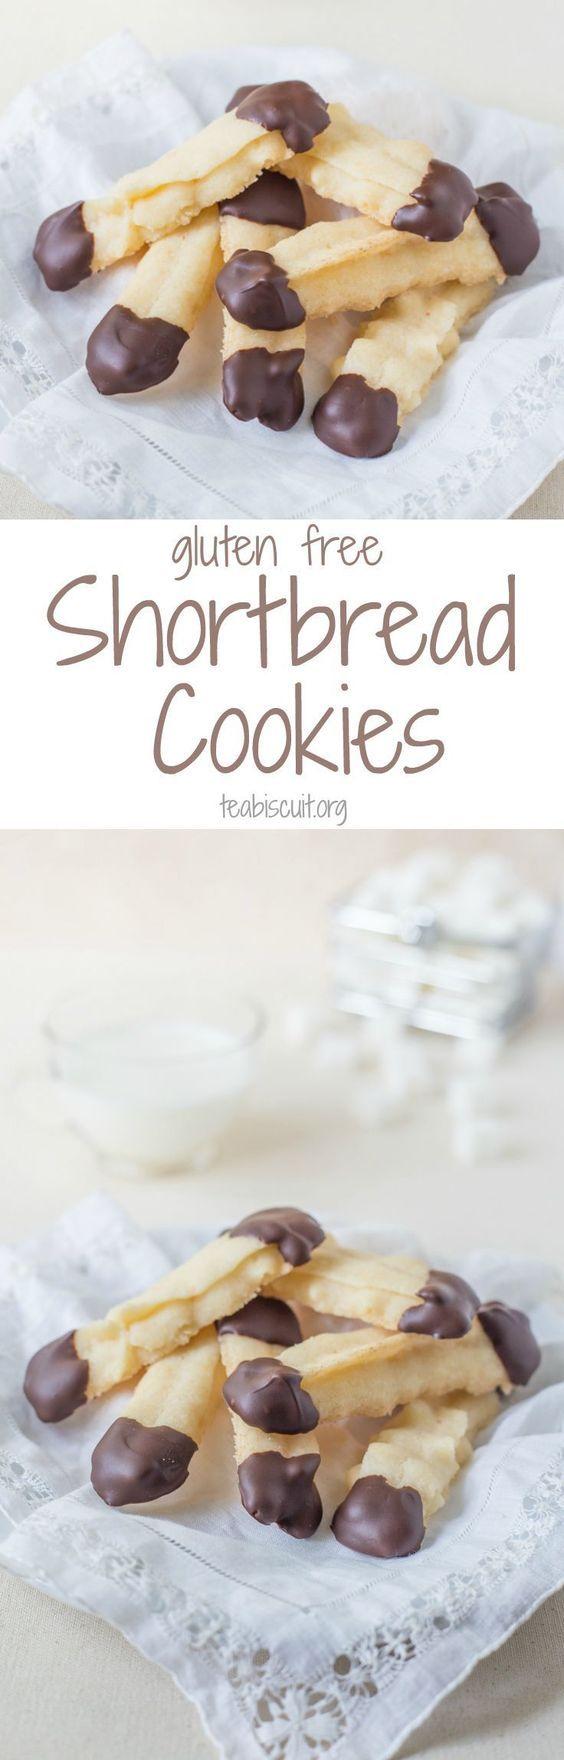 Free shortbread cookies recipe